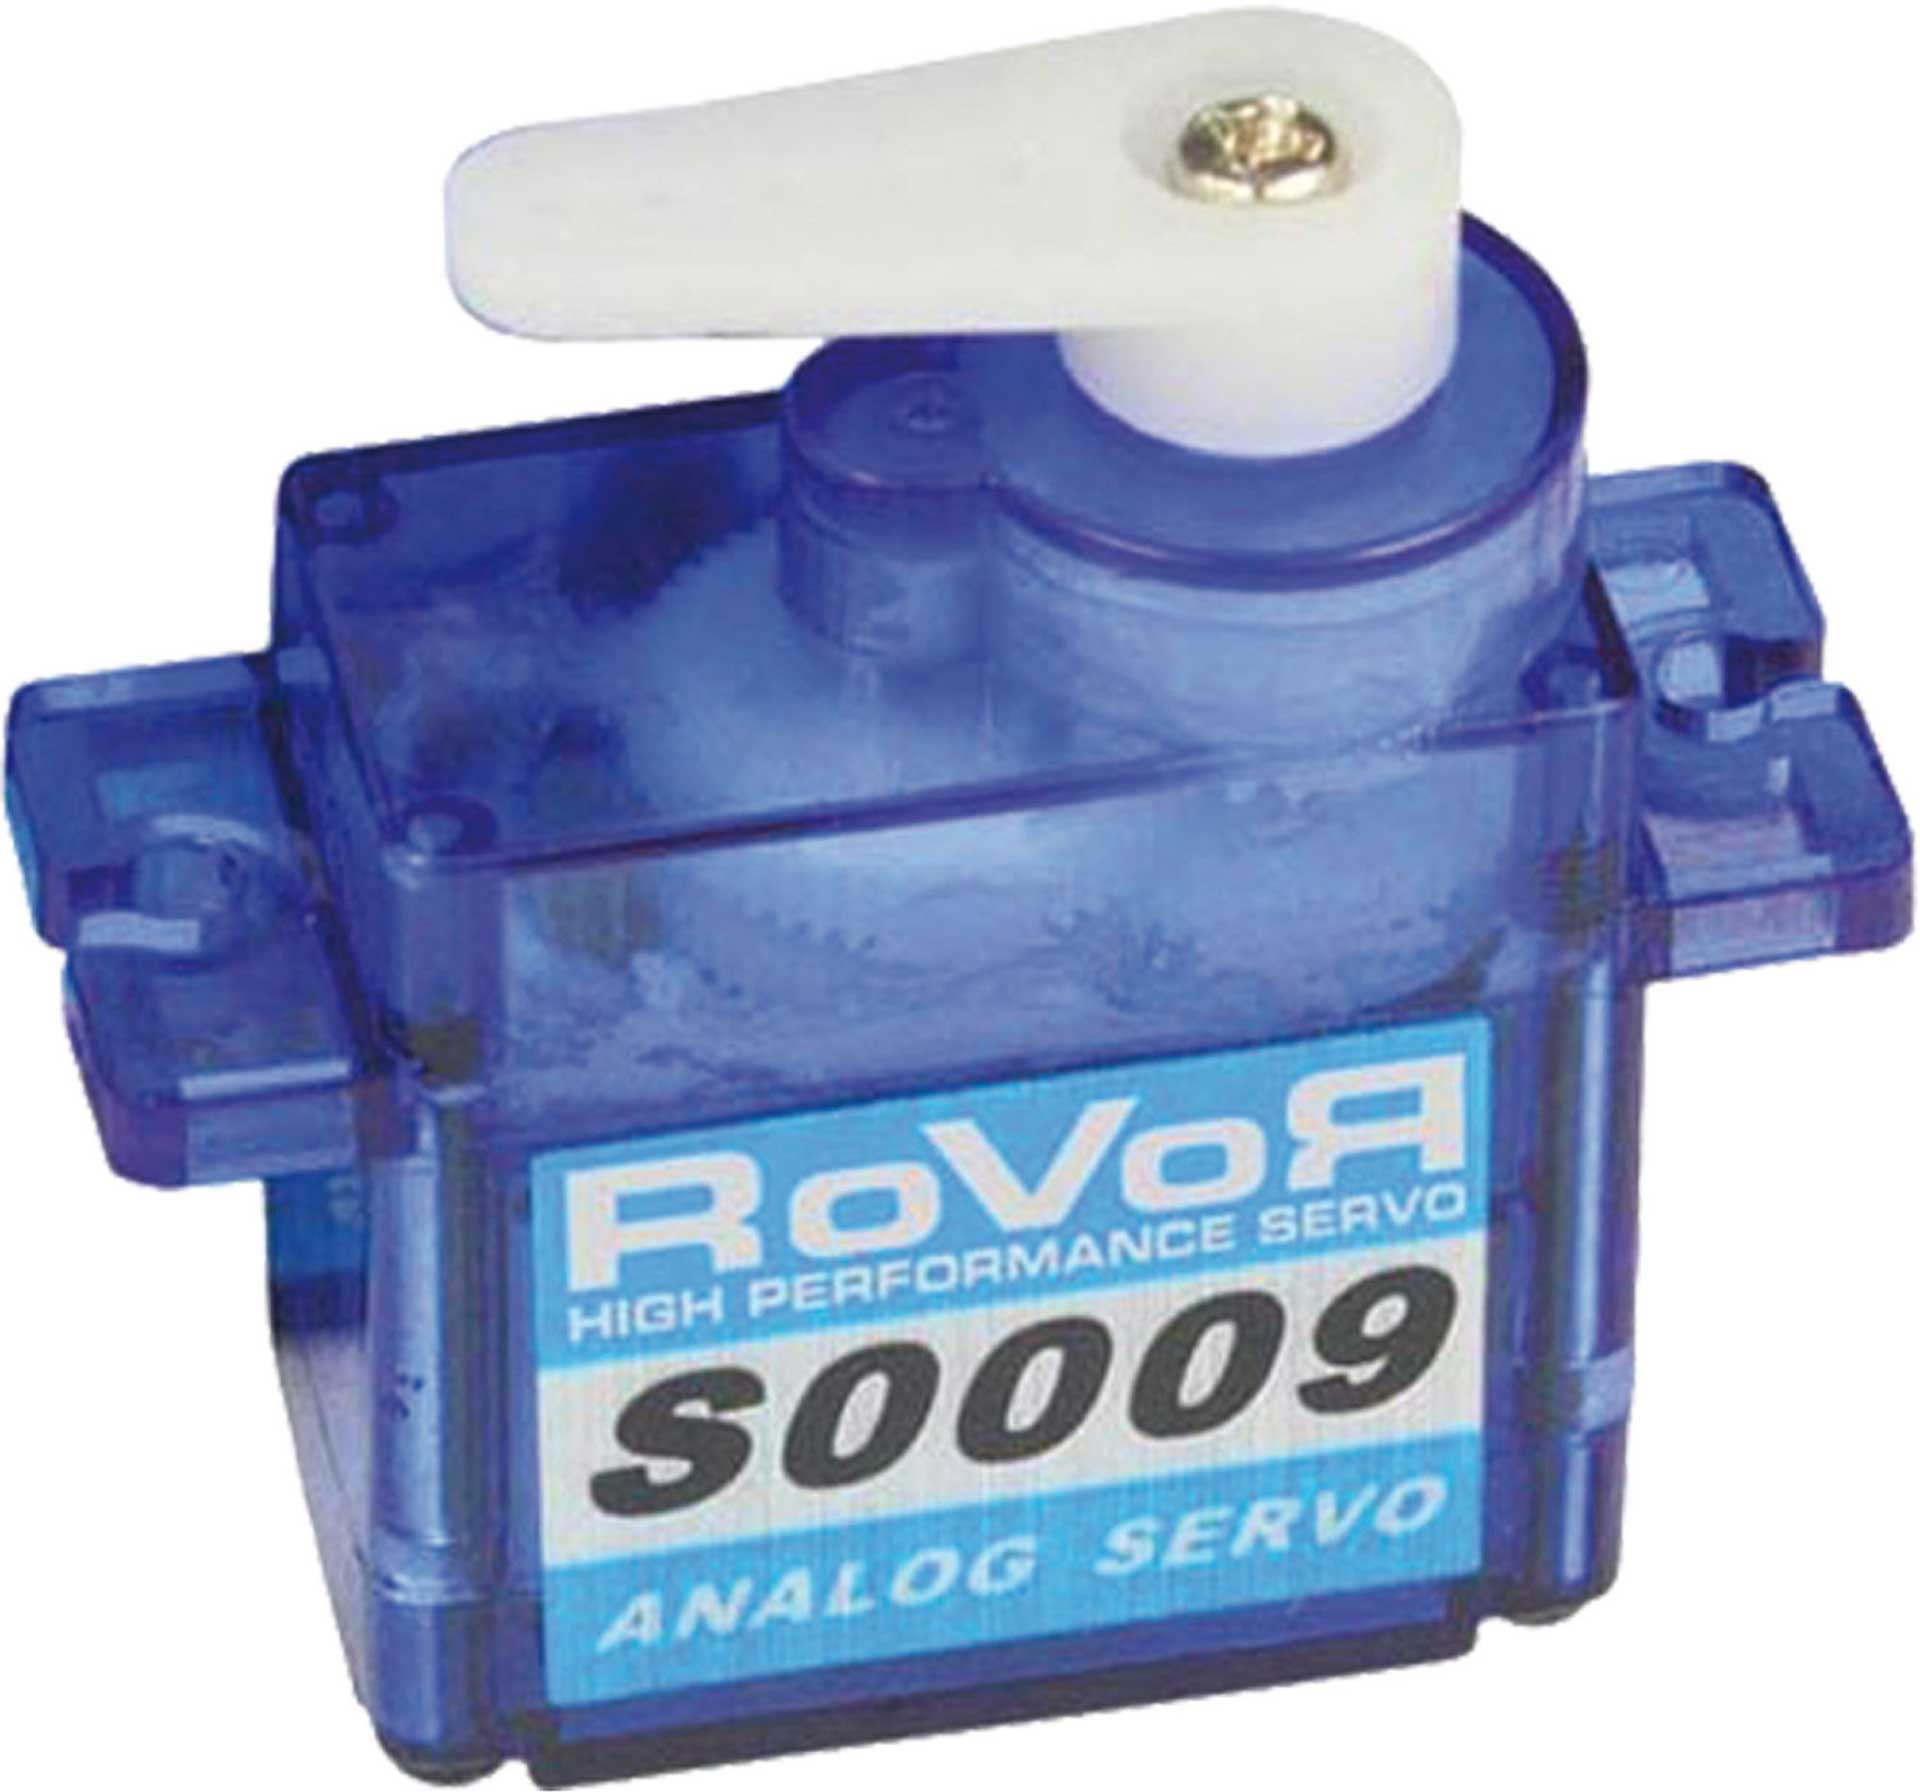 Robbe Modellsport ROVOR SERVO FS 0009 DIGITAL MG